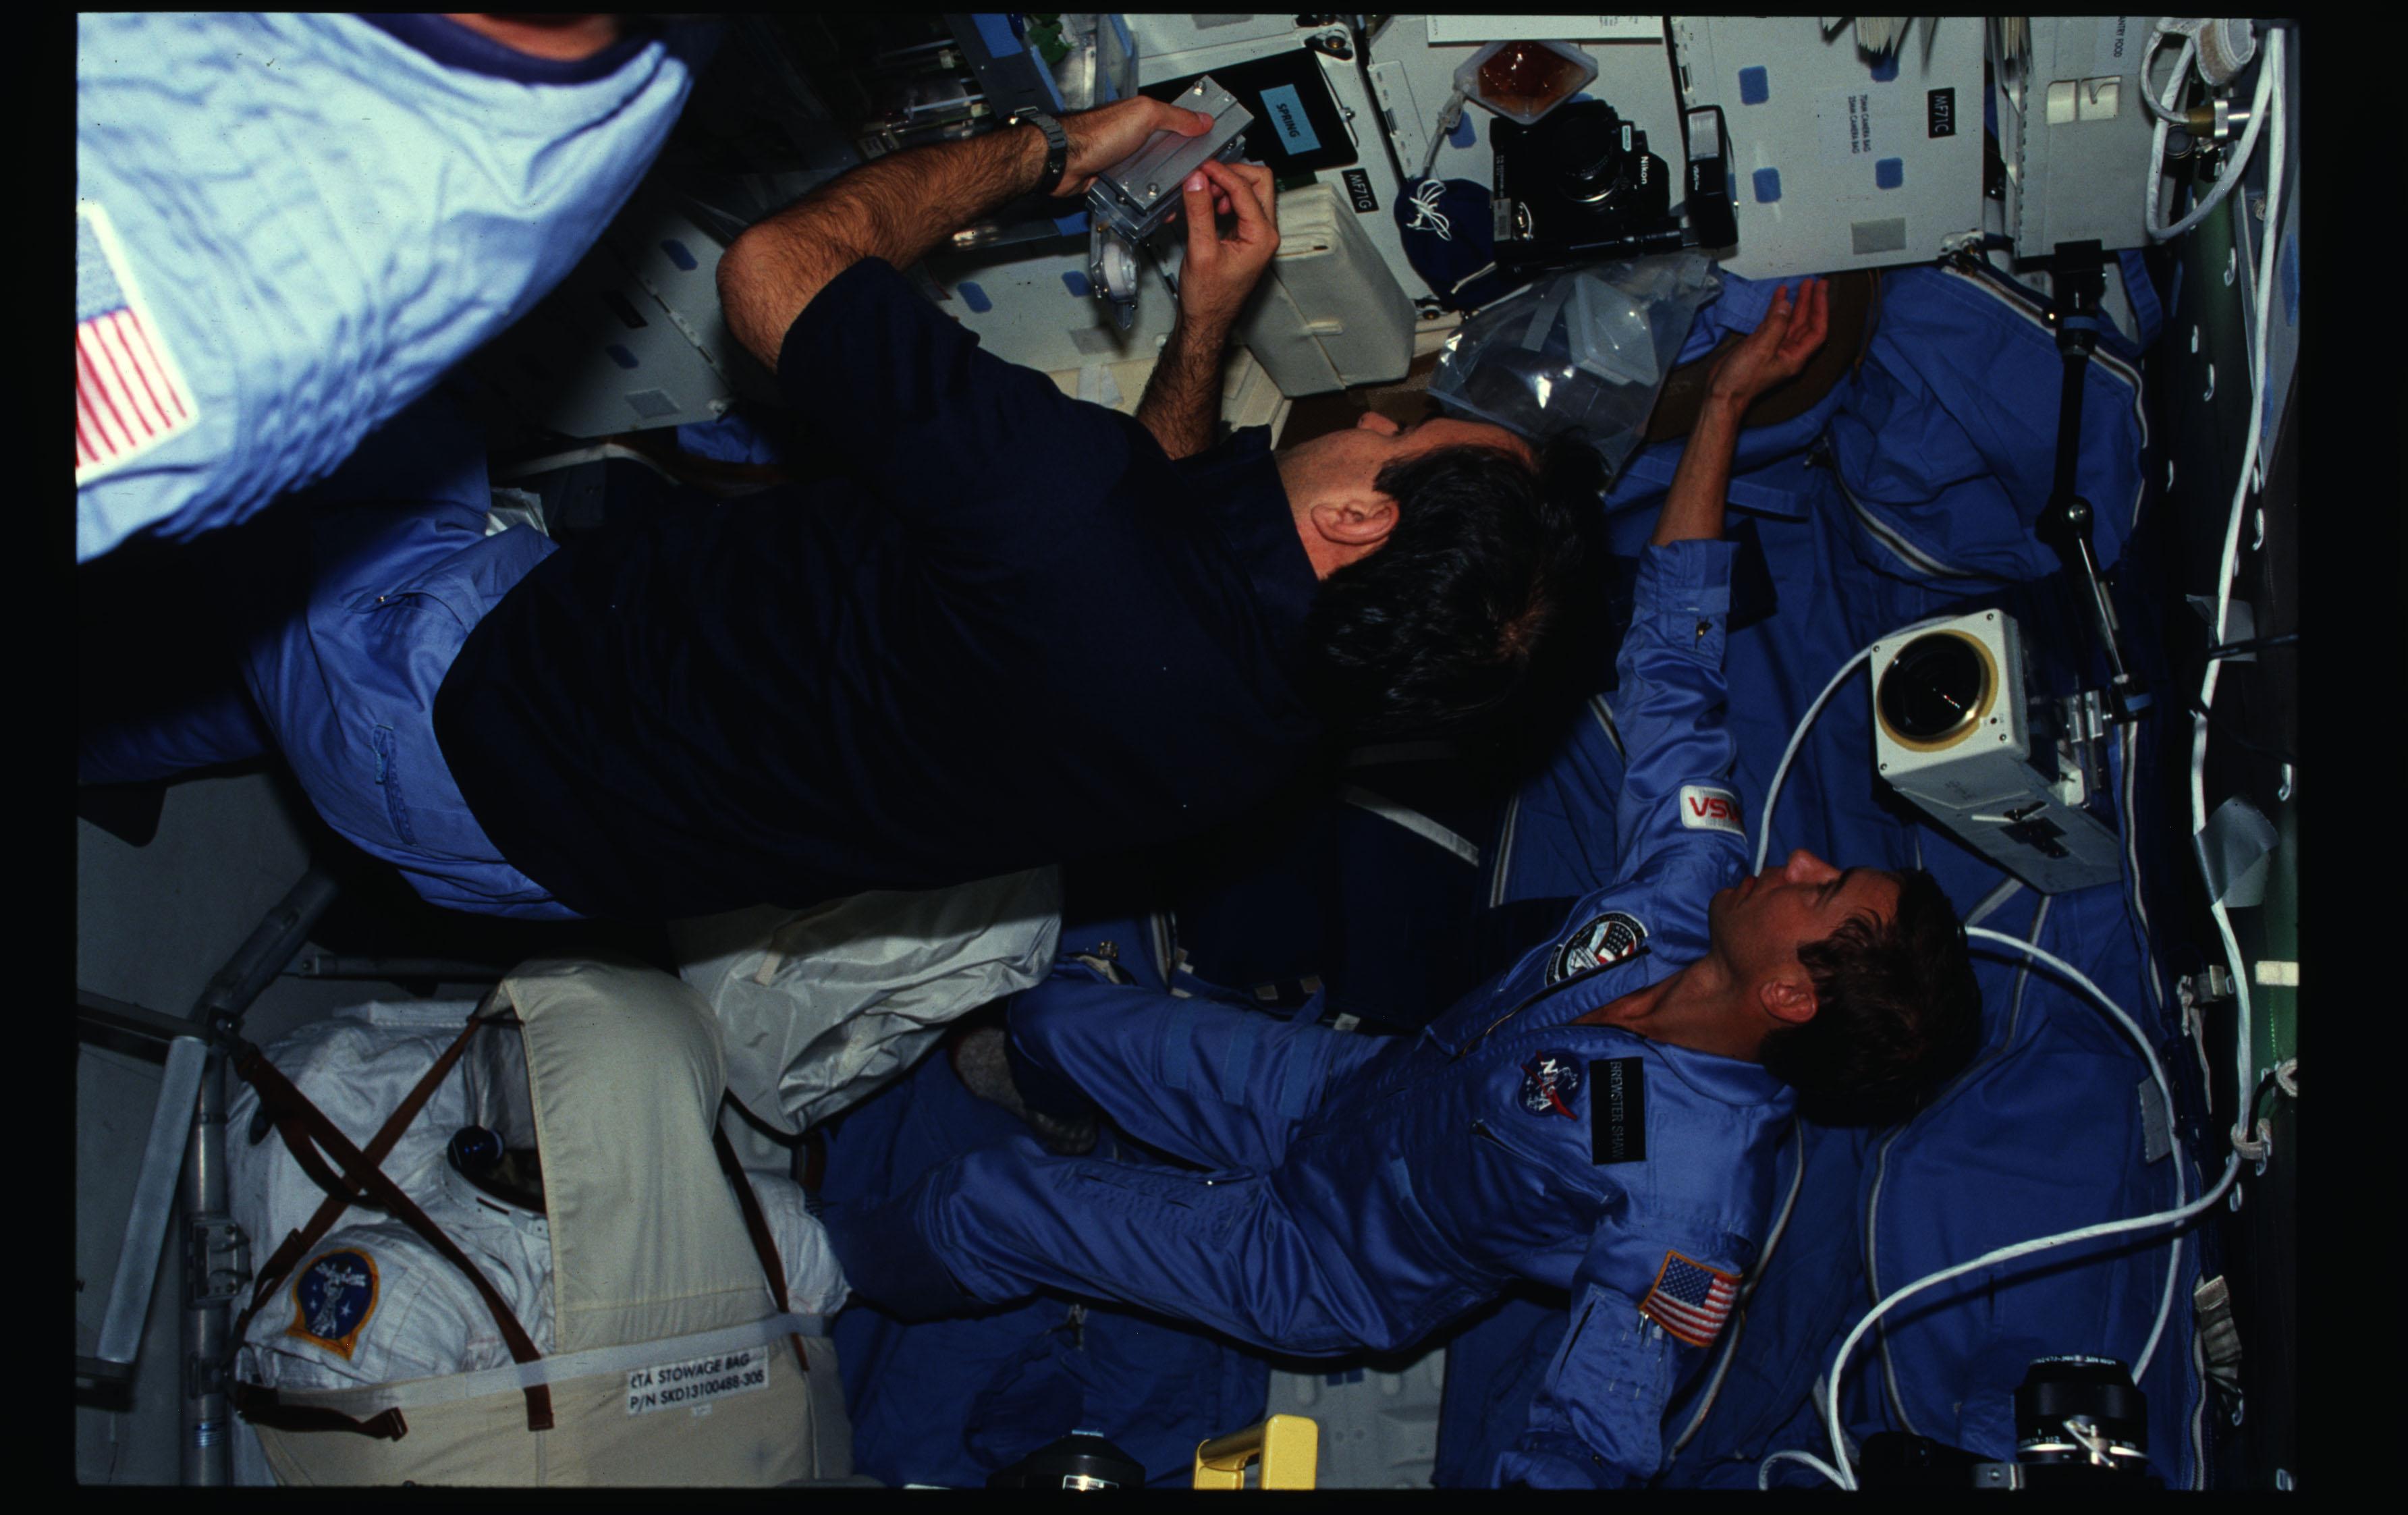 61B-02-018 - STS-61B - STS-61B crew activities